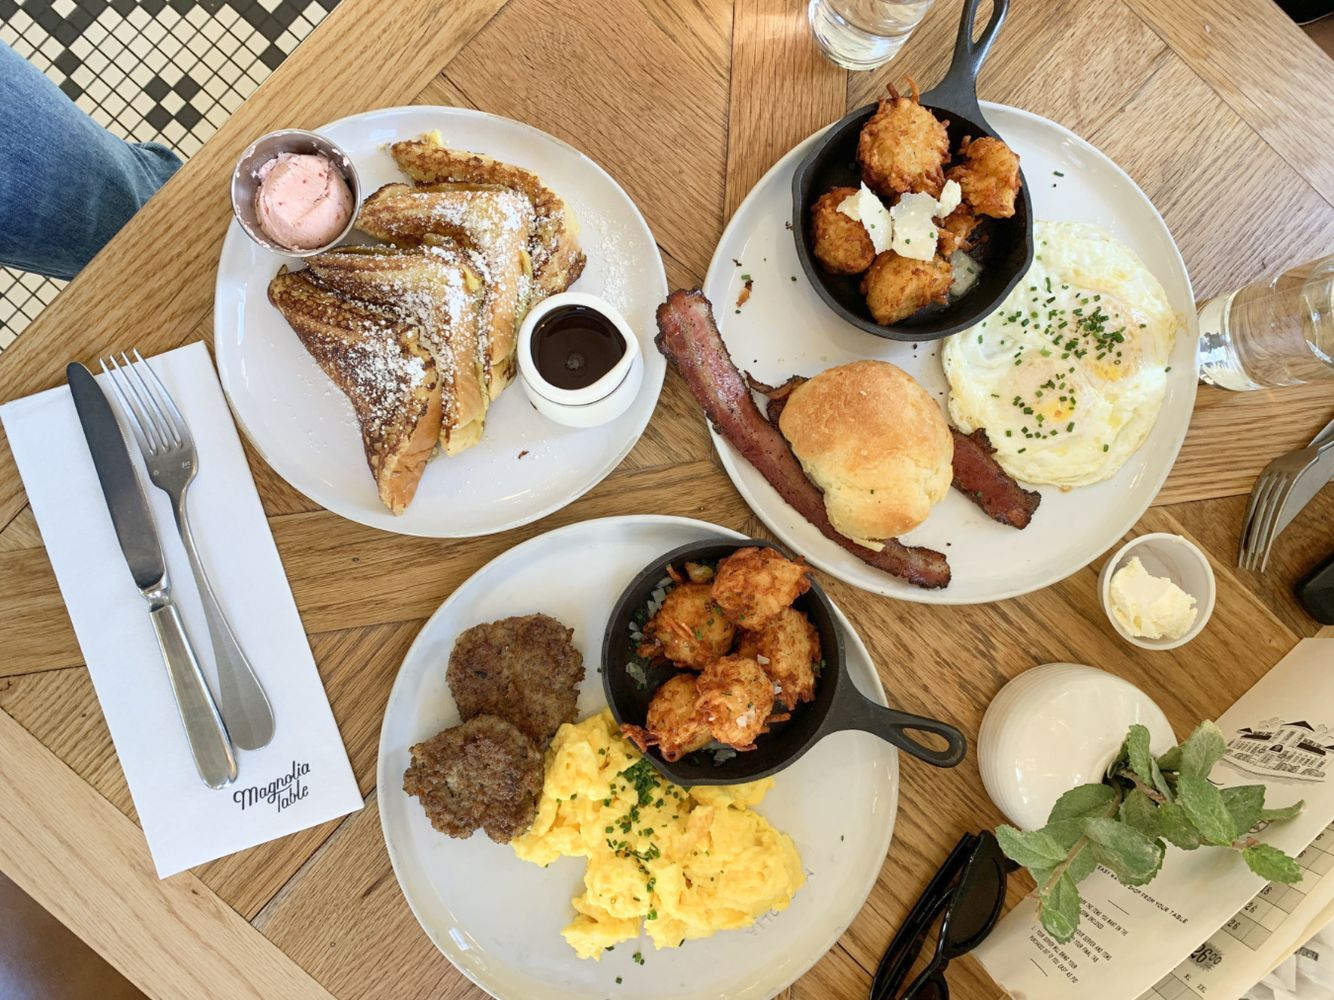 Magnolia Table Breakfast in Waco